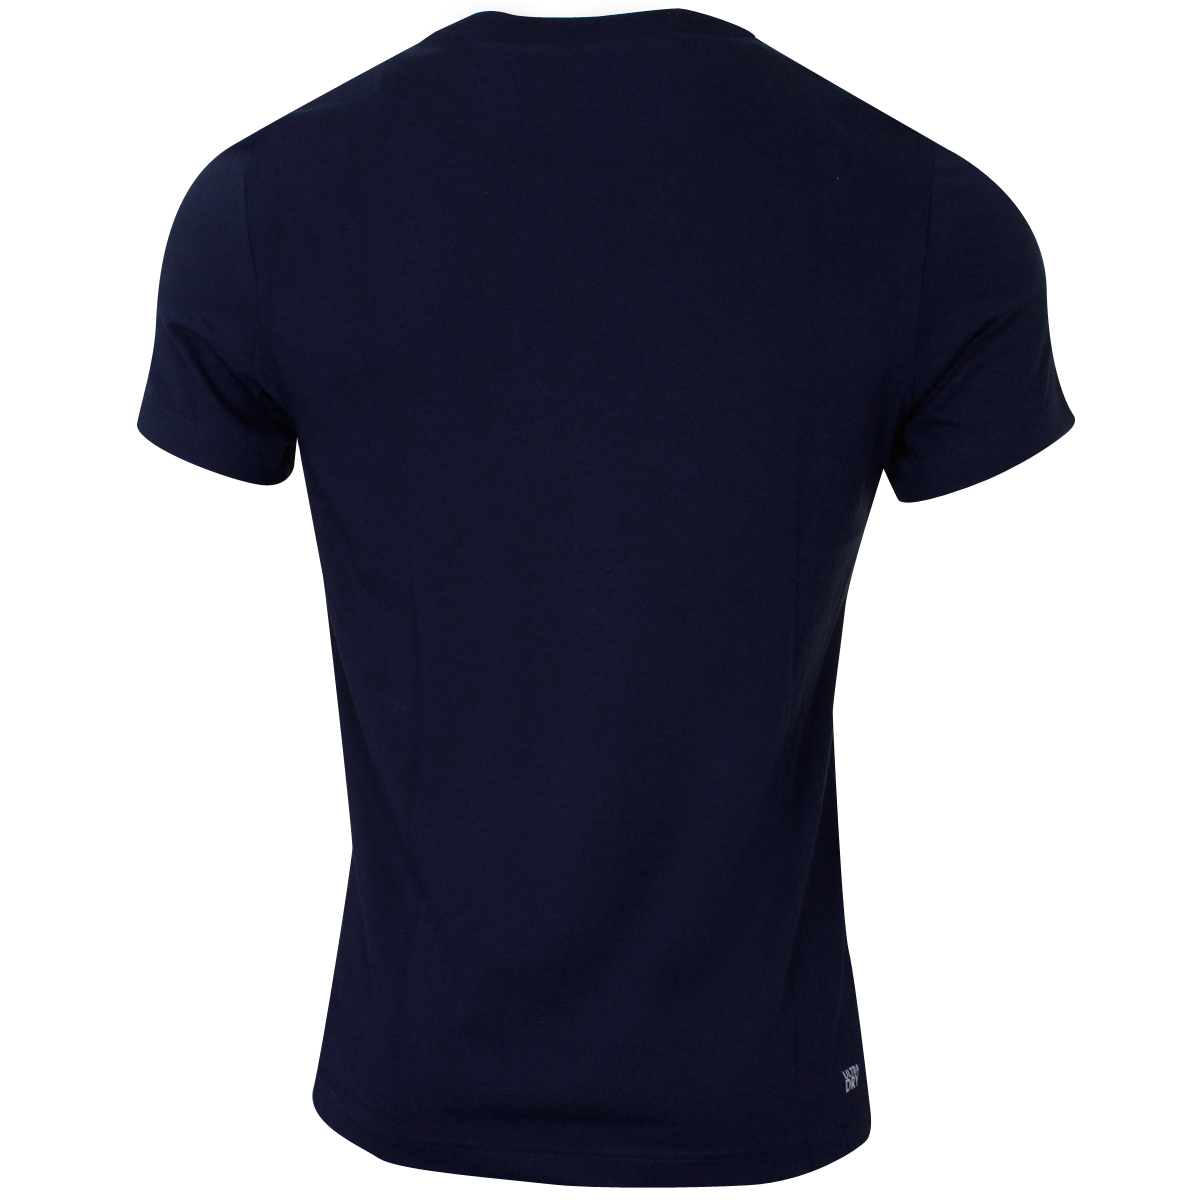 Lacoste-Mens-Oversized-Crocodile-Ultra-Dry-Cotton-Blend-T-Shirt-30-OFF-RRP thumbnail 8